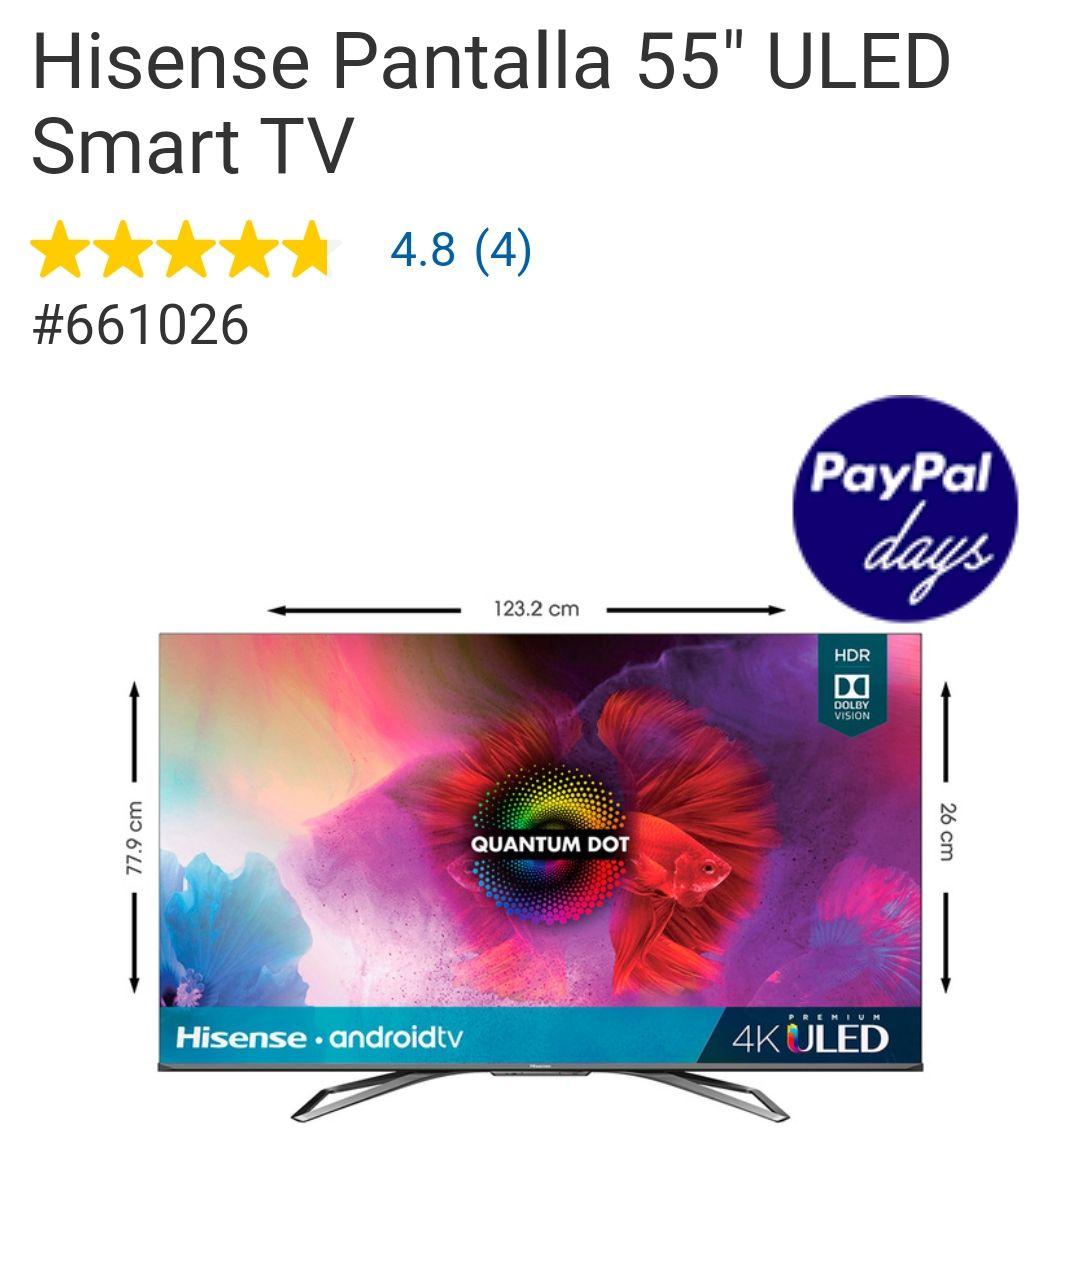 "Costco: Hisense Pantalla 55 H9G "" ULED Smart TV"